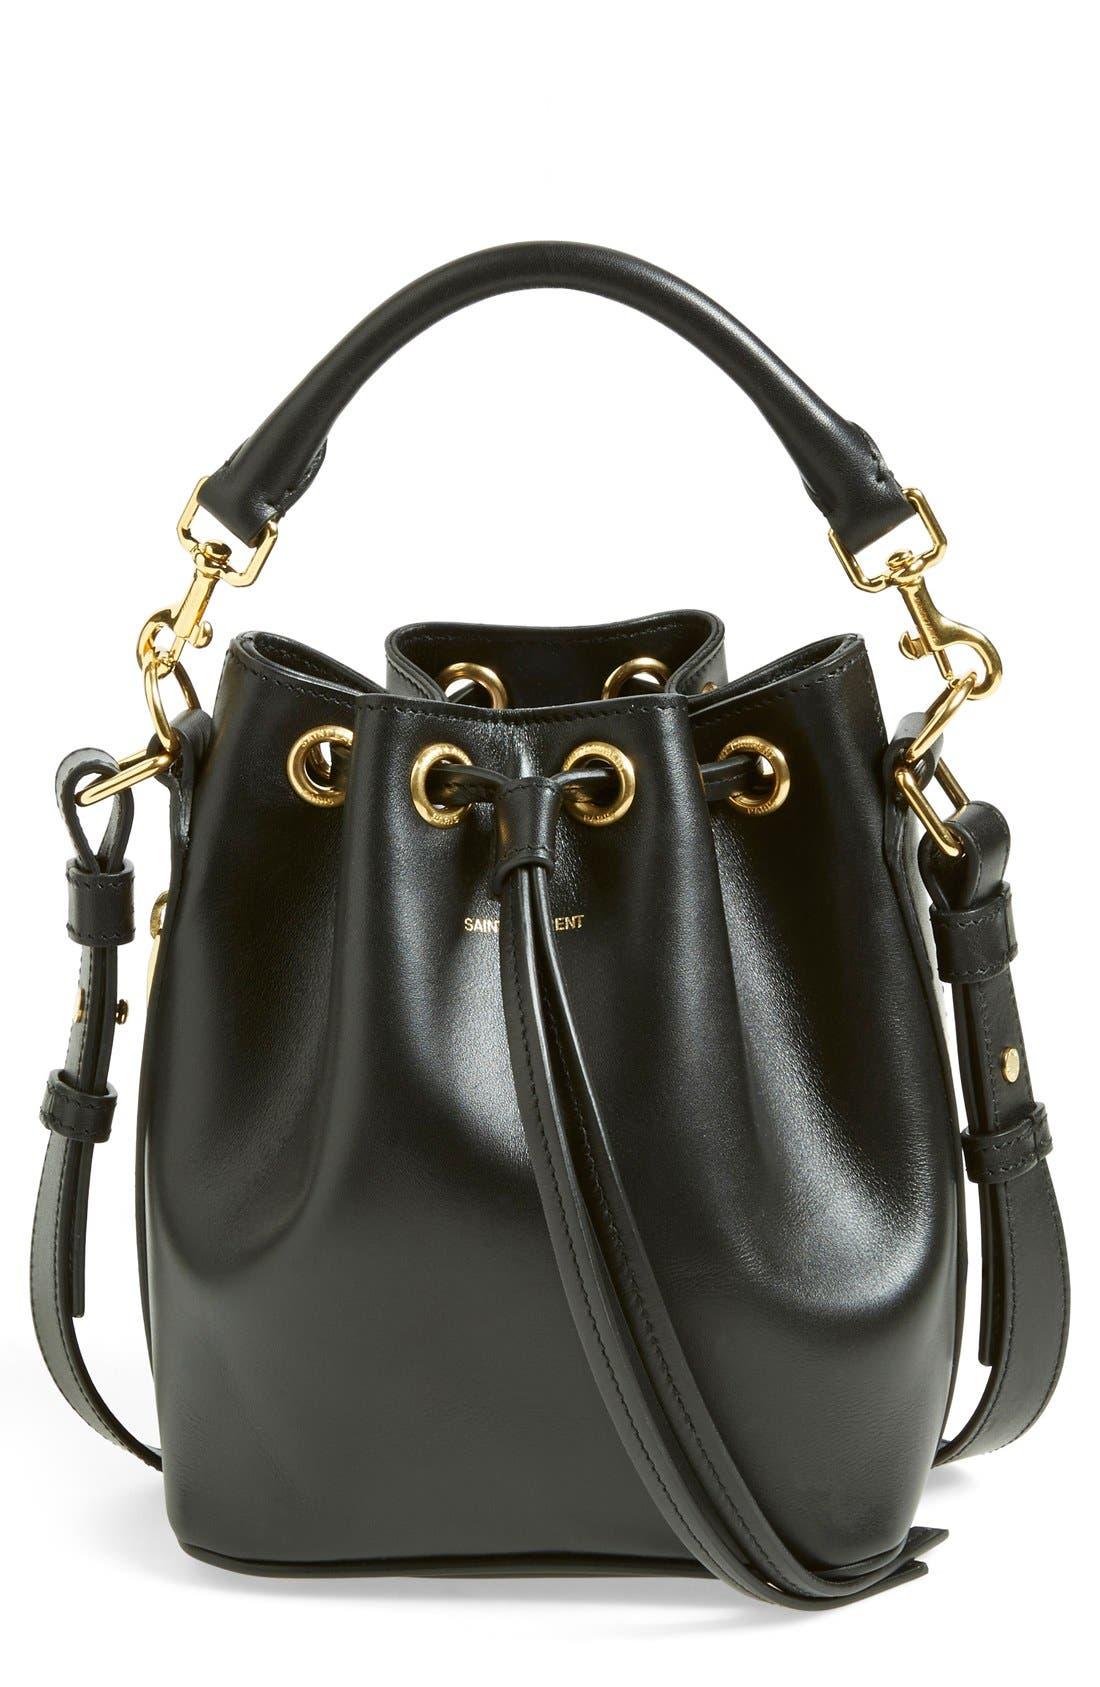 'Small' Calfskin Leather Bucket Bag,                             Main thumbnail 1, color,                             001